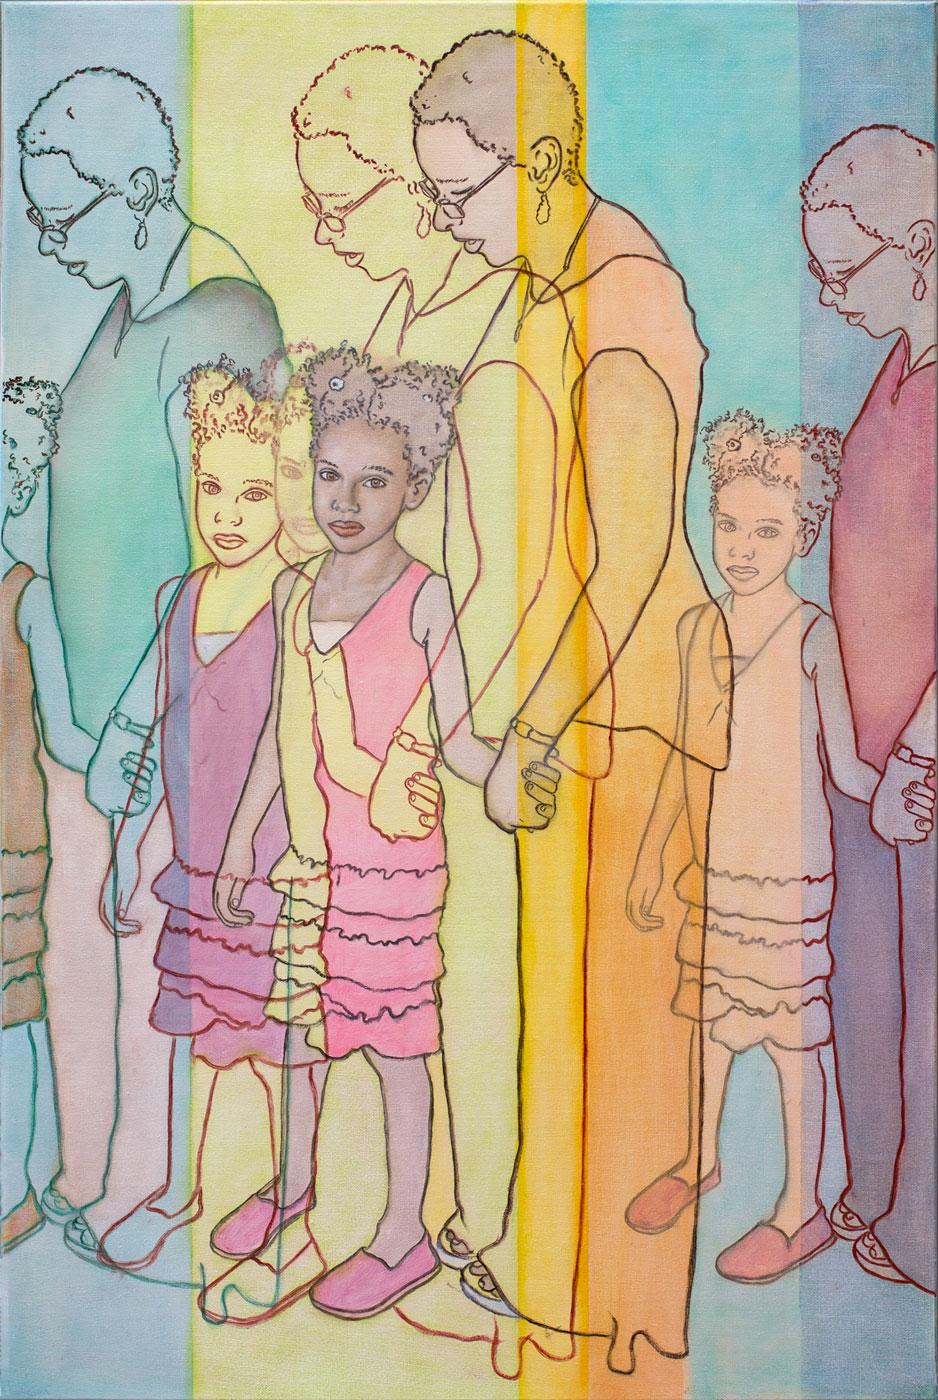 portrait-artist-aunt-niece-african-american-painter-malayka-gormally.jpg